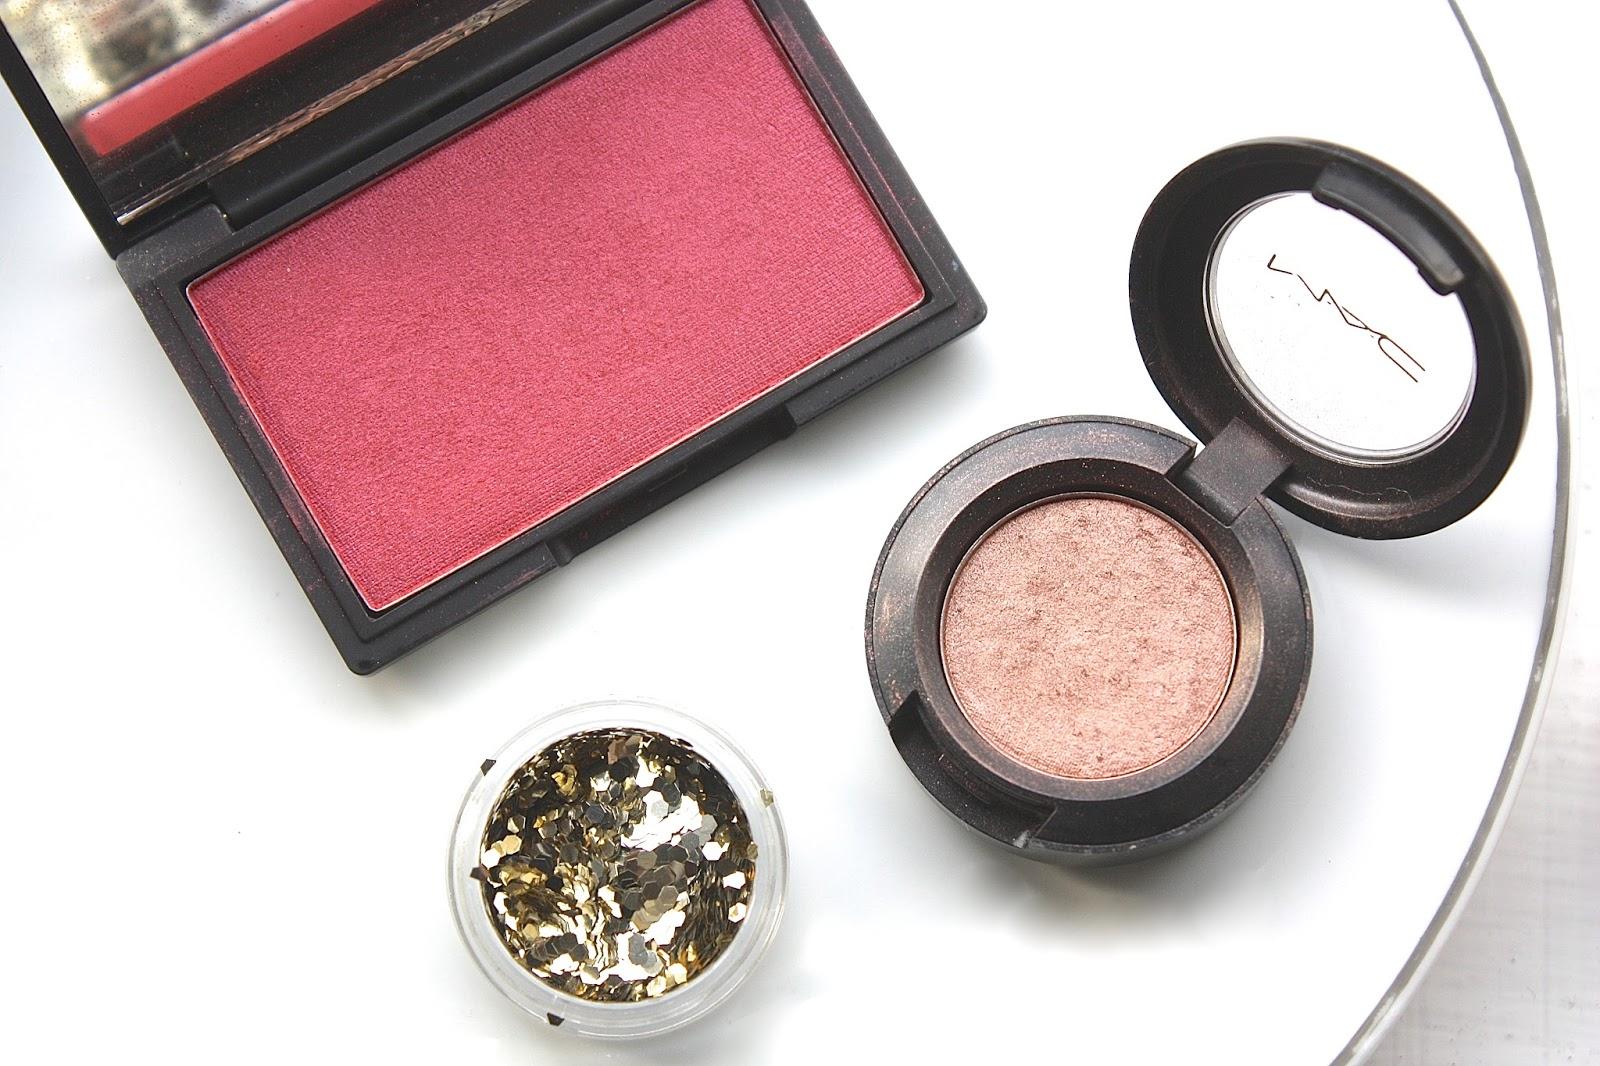 Sleek Blush Pomegranate Review